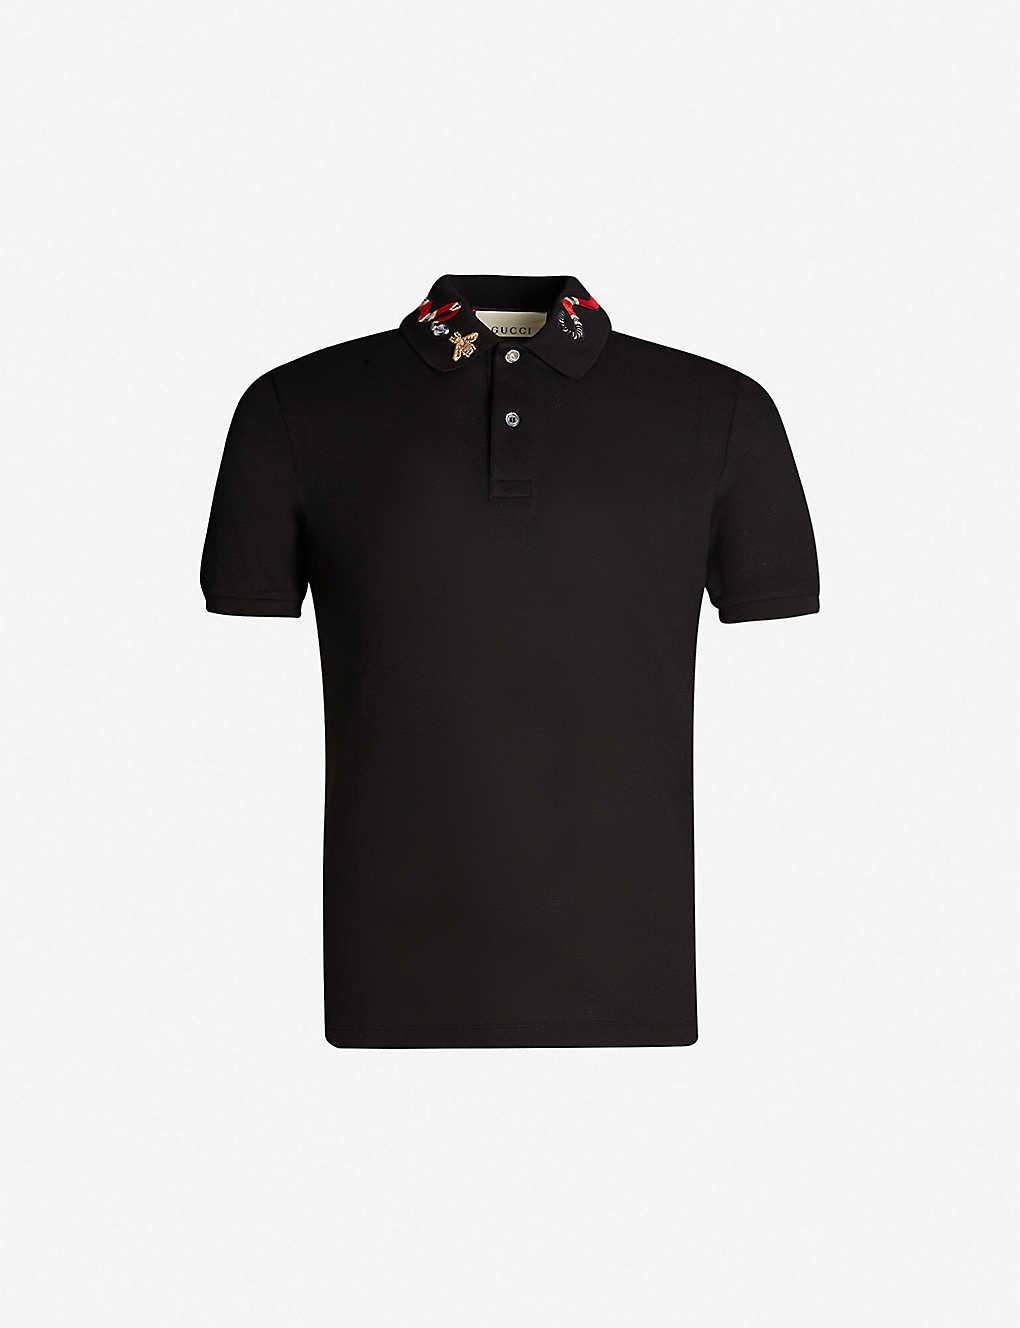 7de7b53b2 GUCCI - Snake-embroidered cotton-piqué polo shirt | Selfridges.com